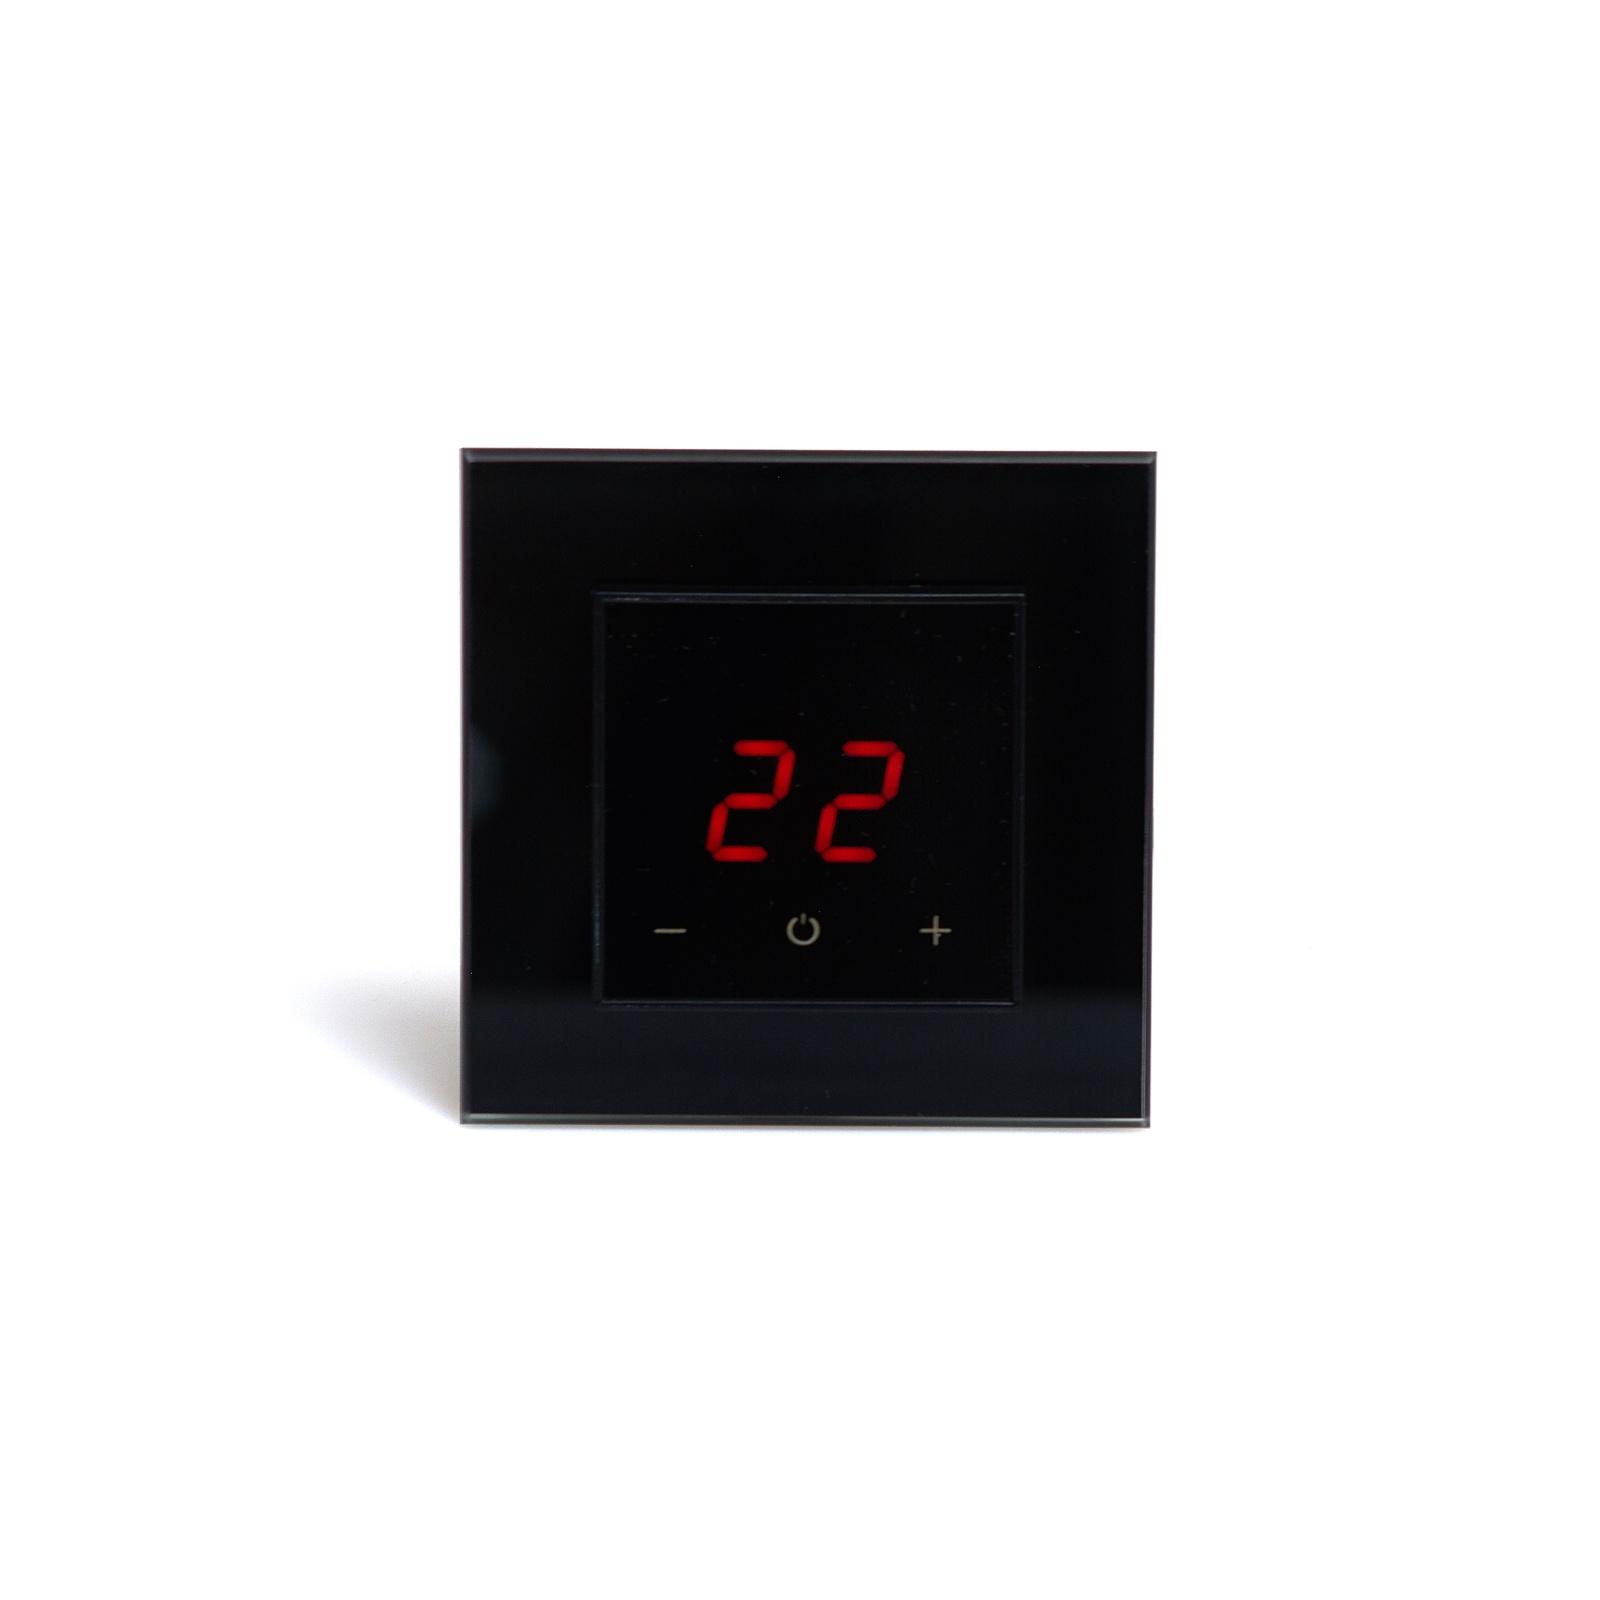 цена на Регулятор теплого пола AURA ORTO 9005, 3509005, черный